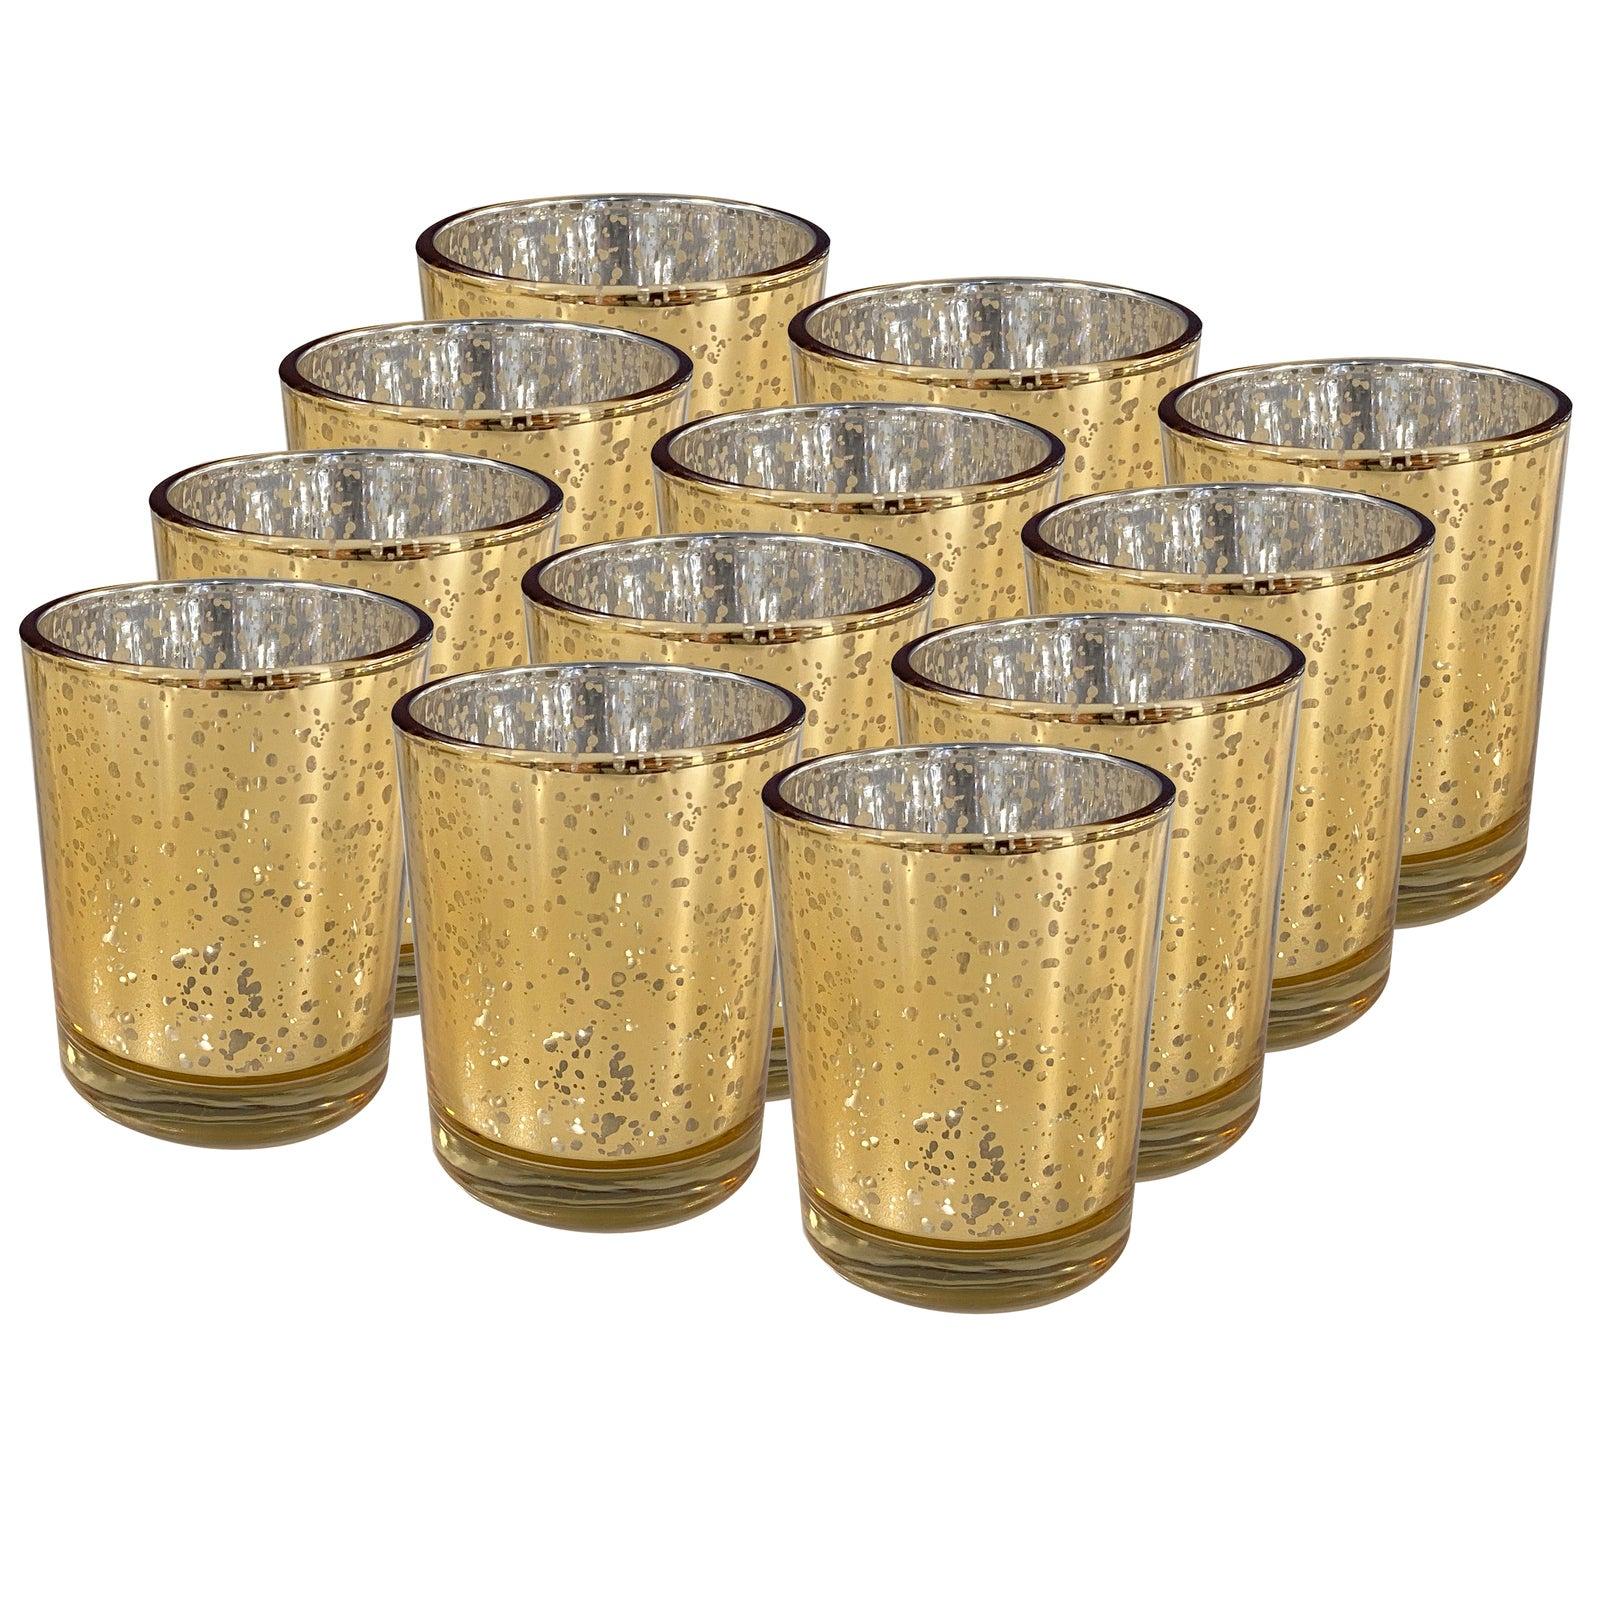 12pc Glass Tea Light Candle/Bomboniere Votive Round Holders Home Decor Gold